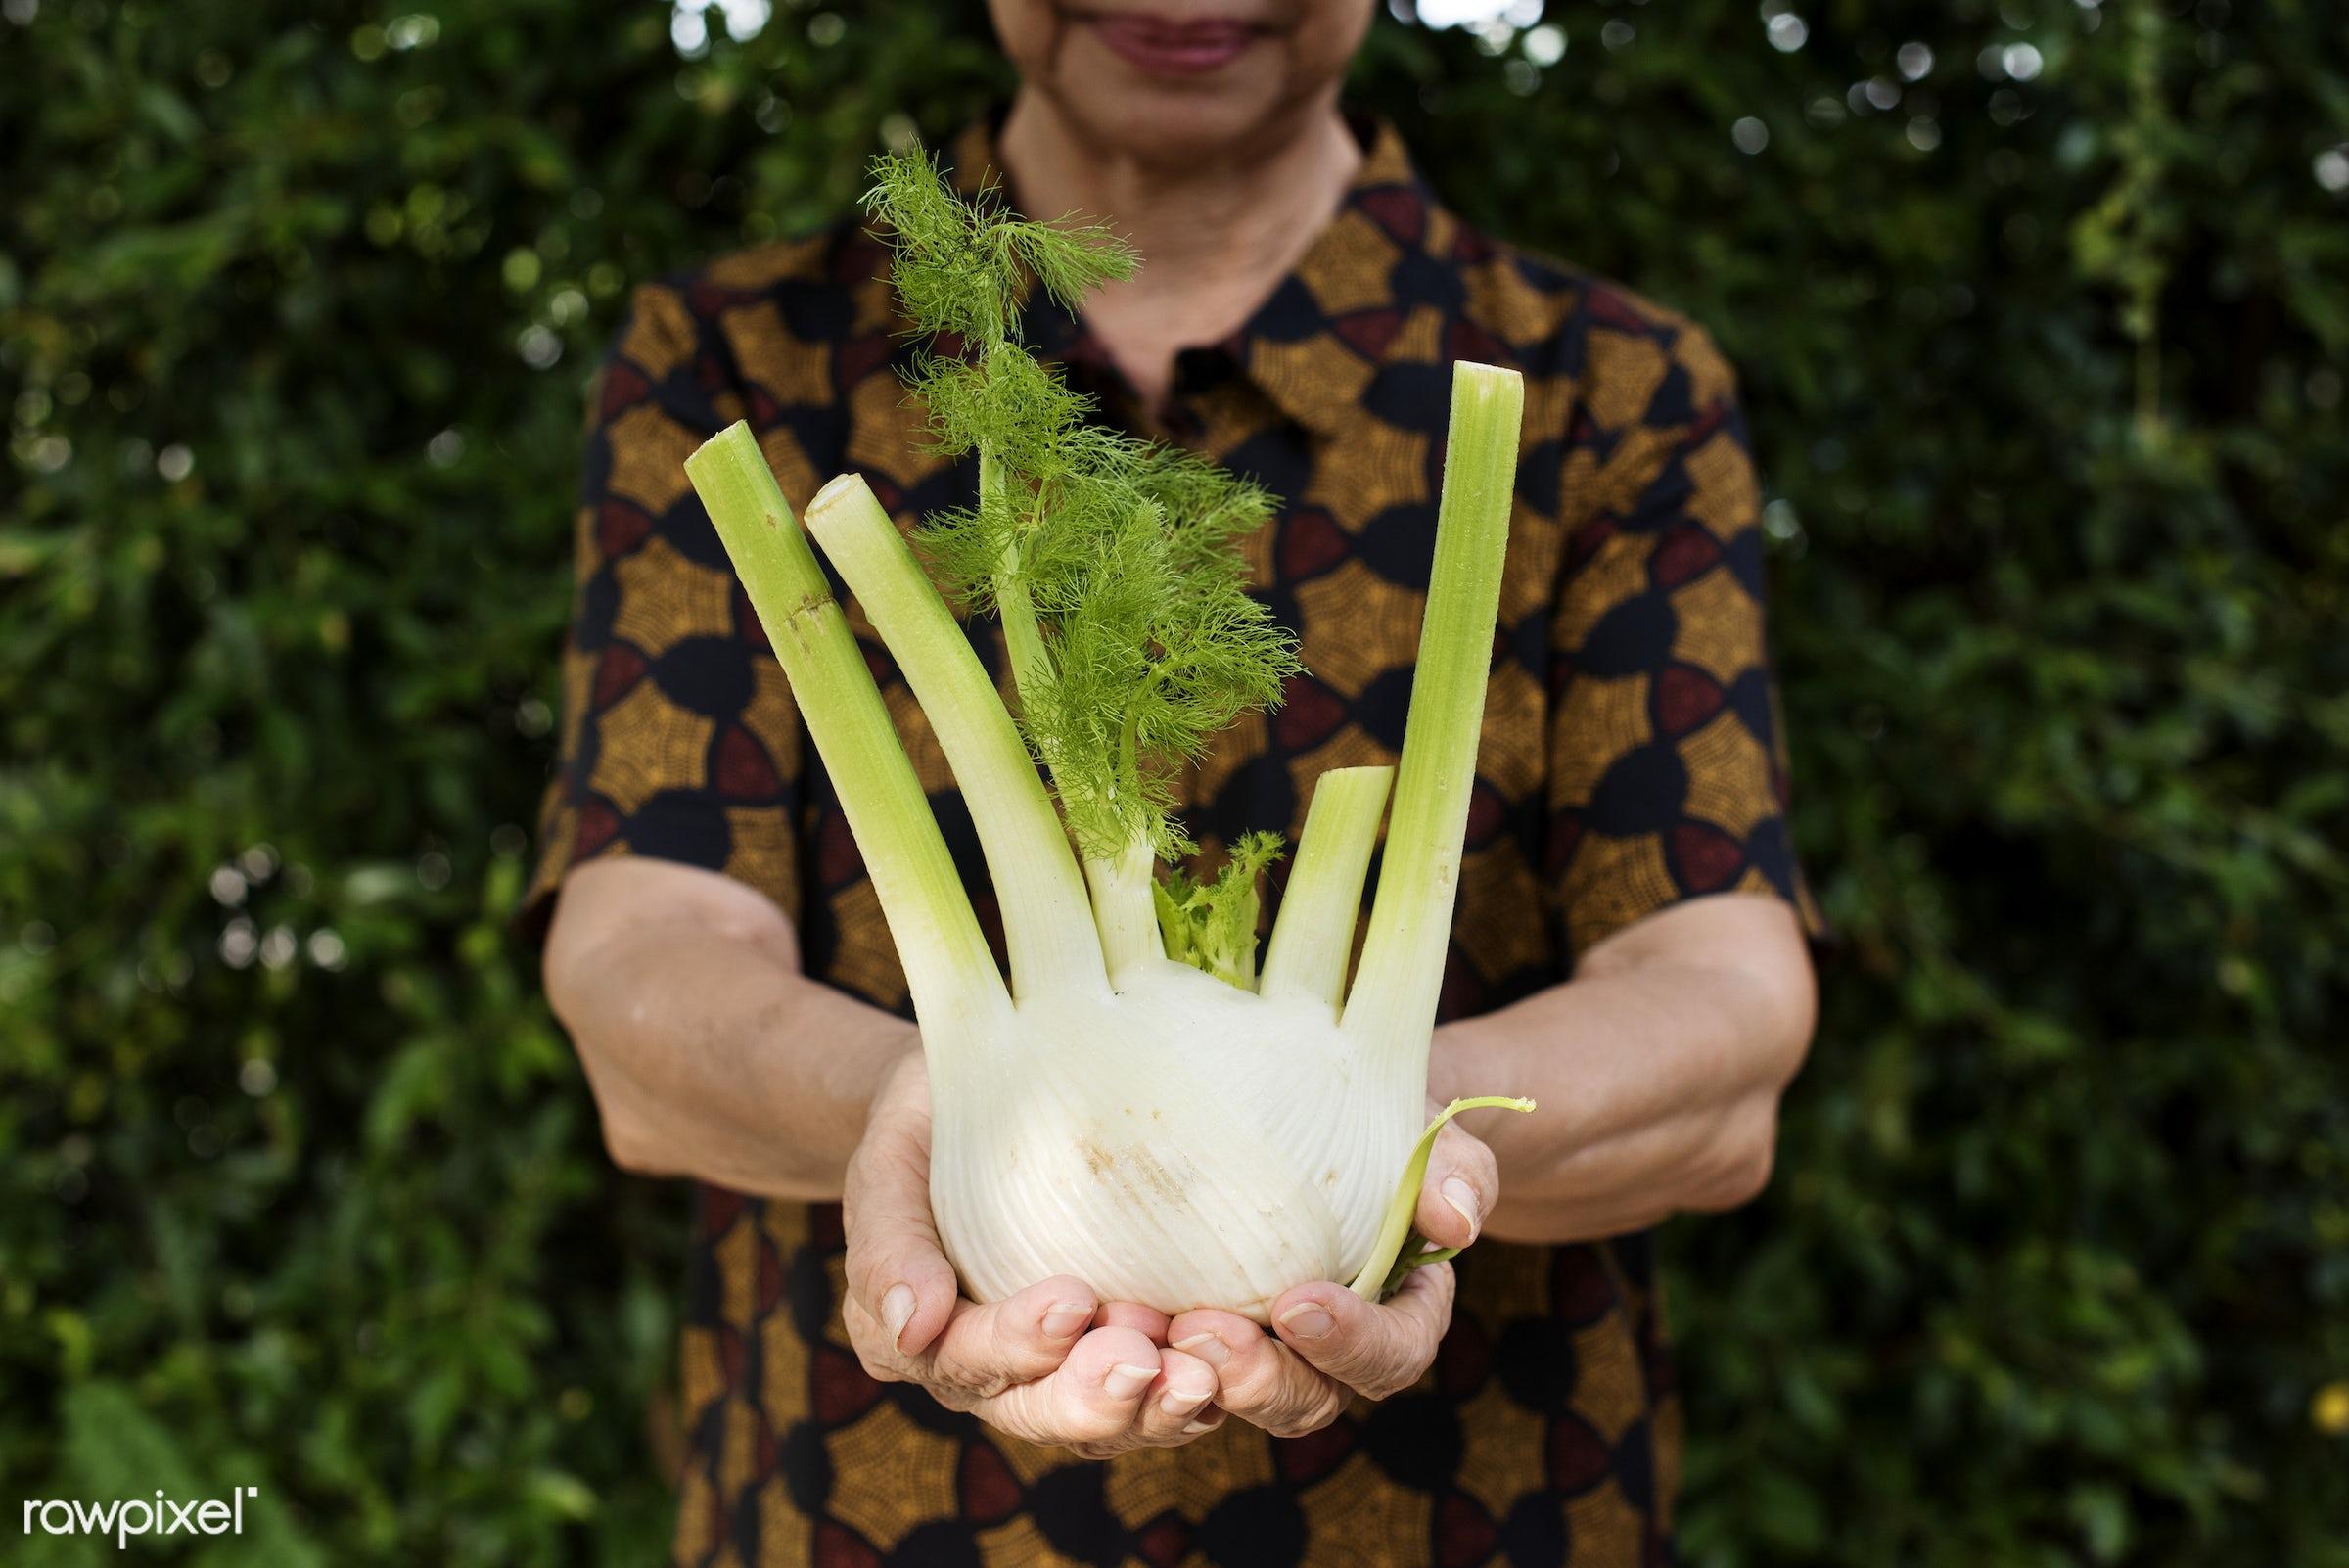 fennel, holding, real, hands, fresh, showing, closeup, healthcare, nutrients, organic, food, vegetable, elderly, senior